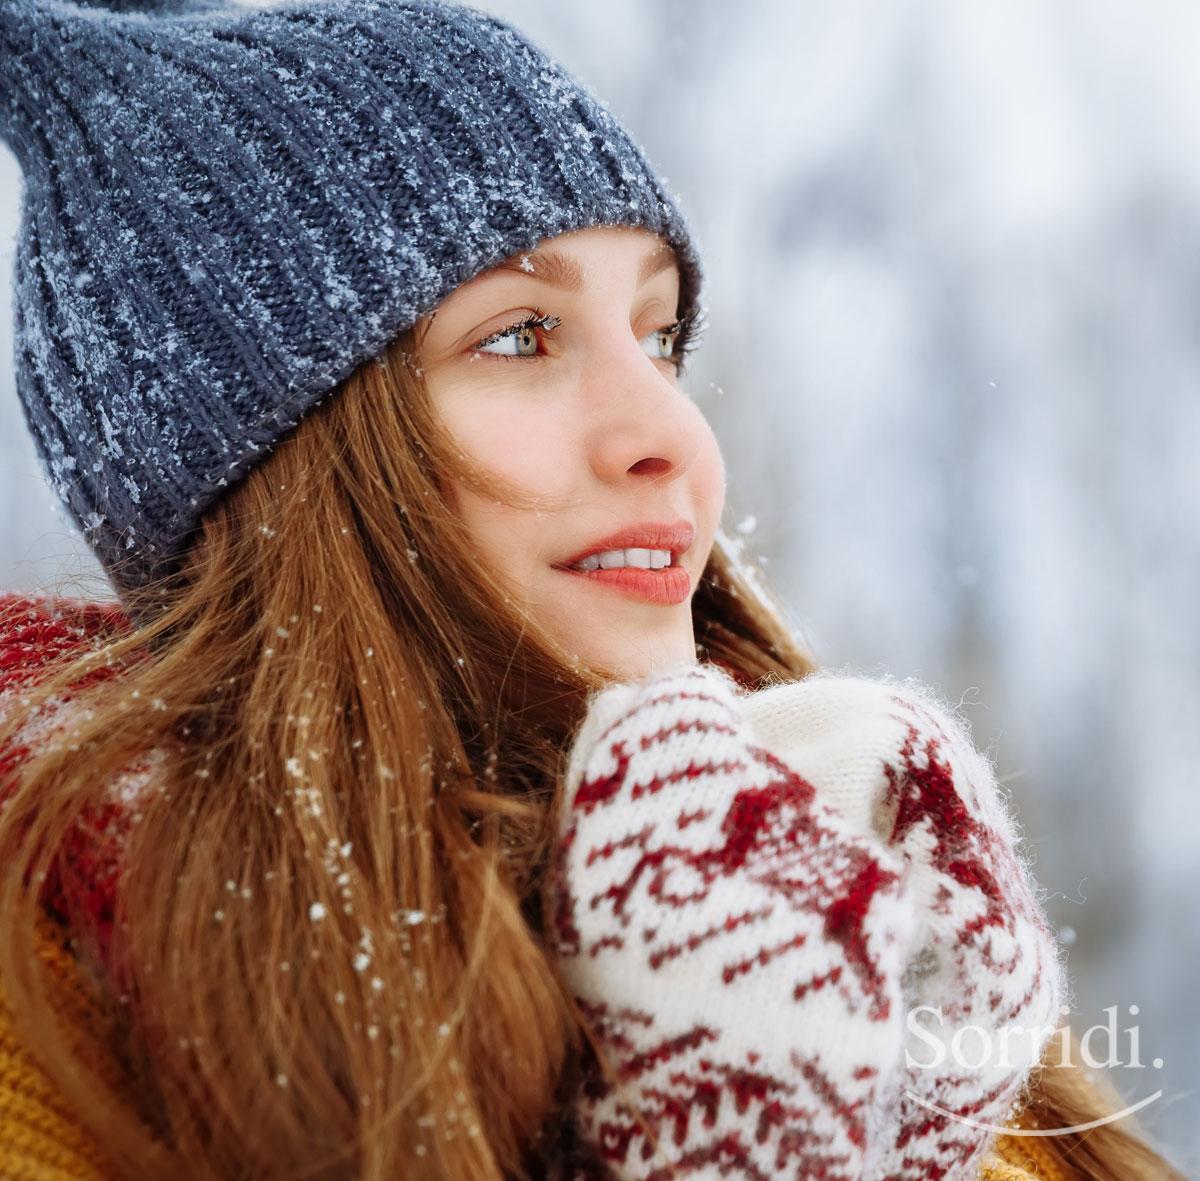 Sorridi-ch-magazine-freddo-e-sensibilita-ai-denti